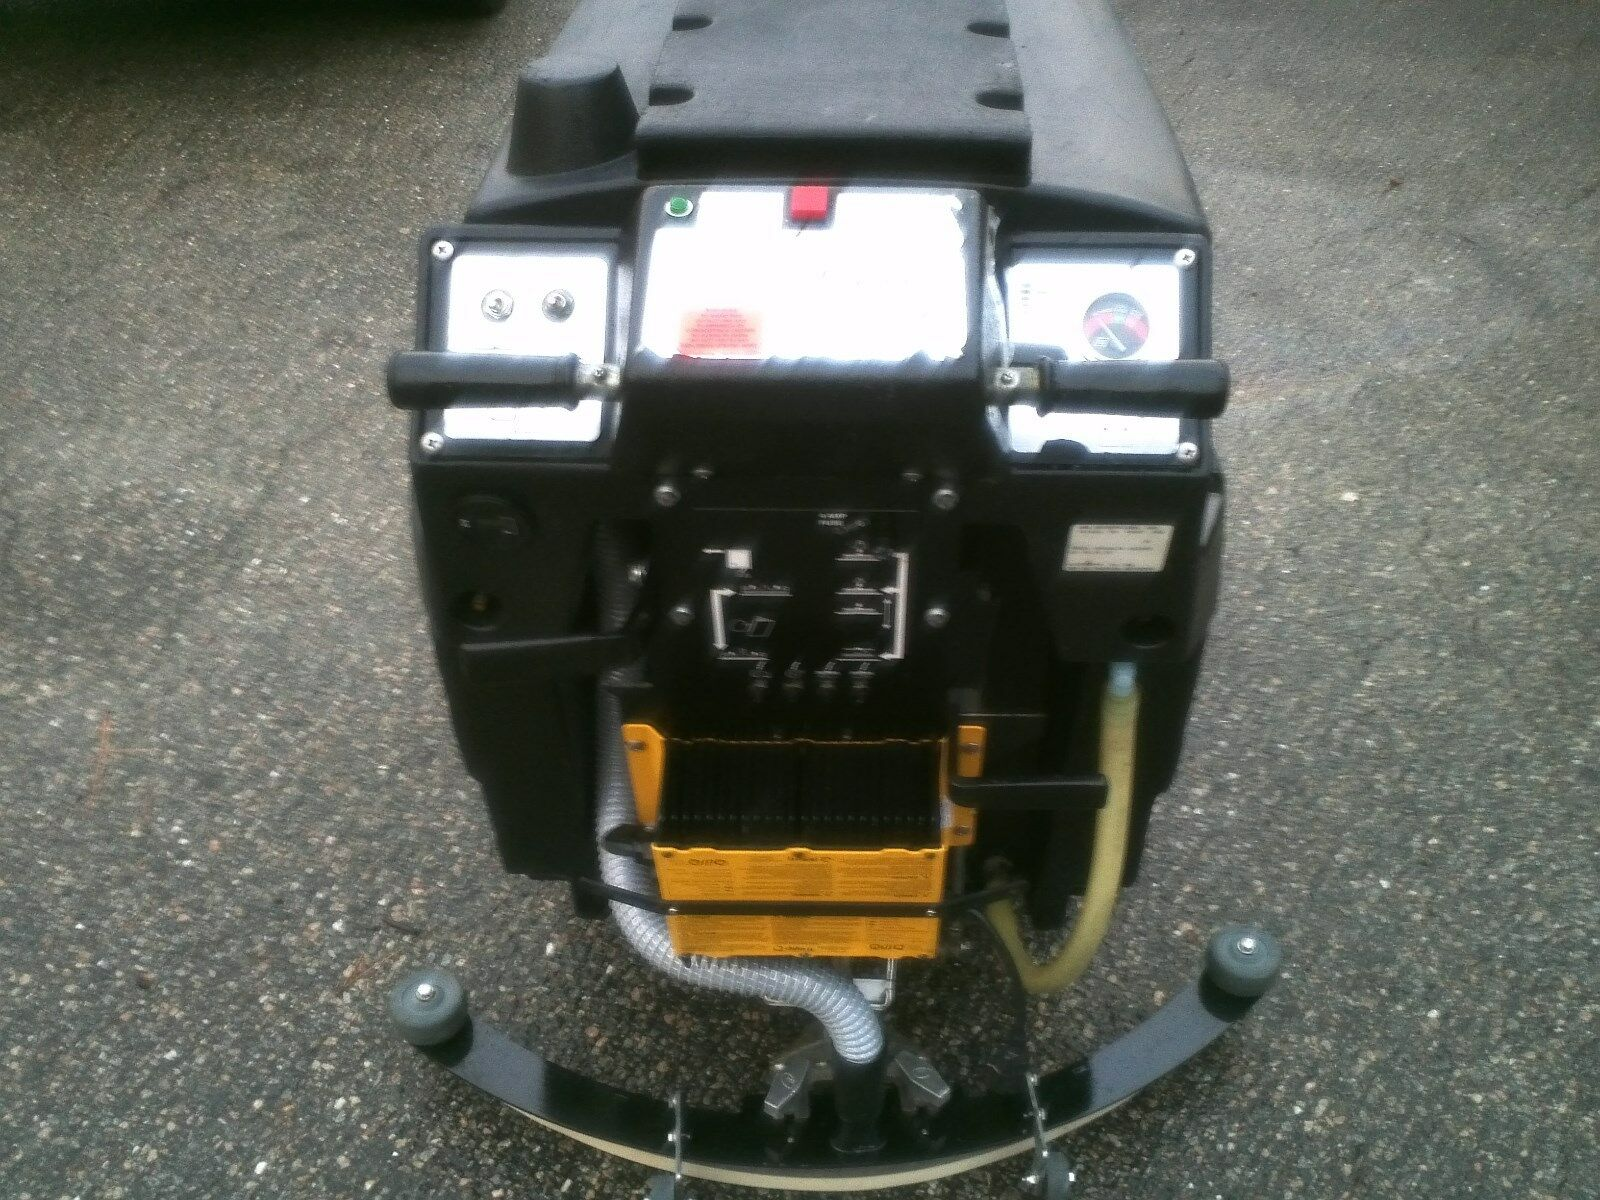 nss wrangler 2625 db manual